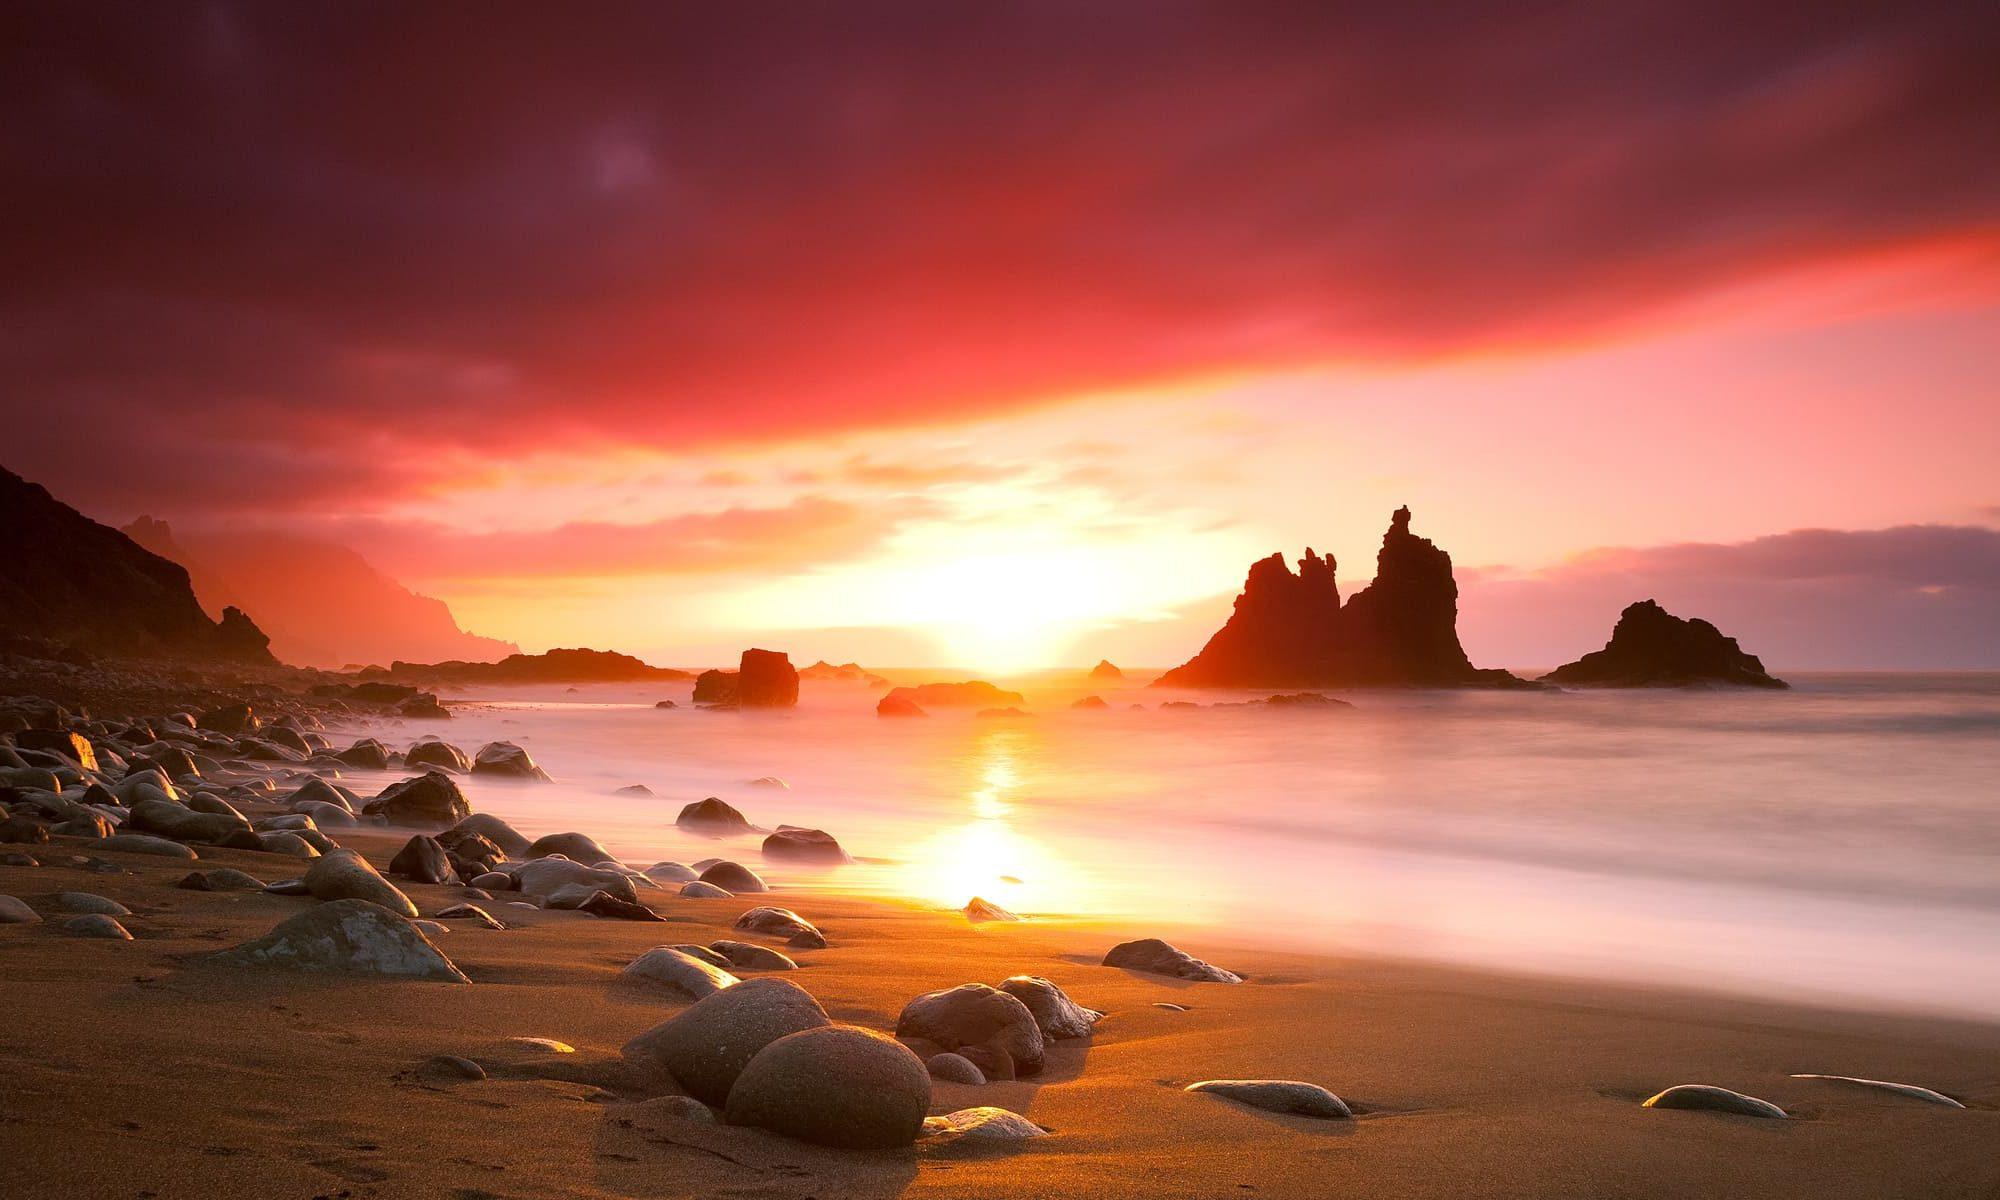 Singlereise nach Teneriffa - Sonnenuntergang am Strand